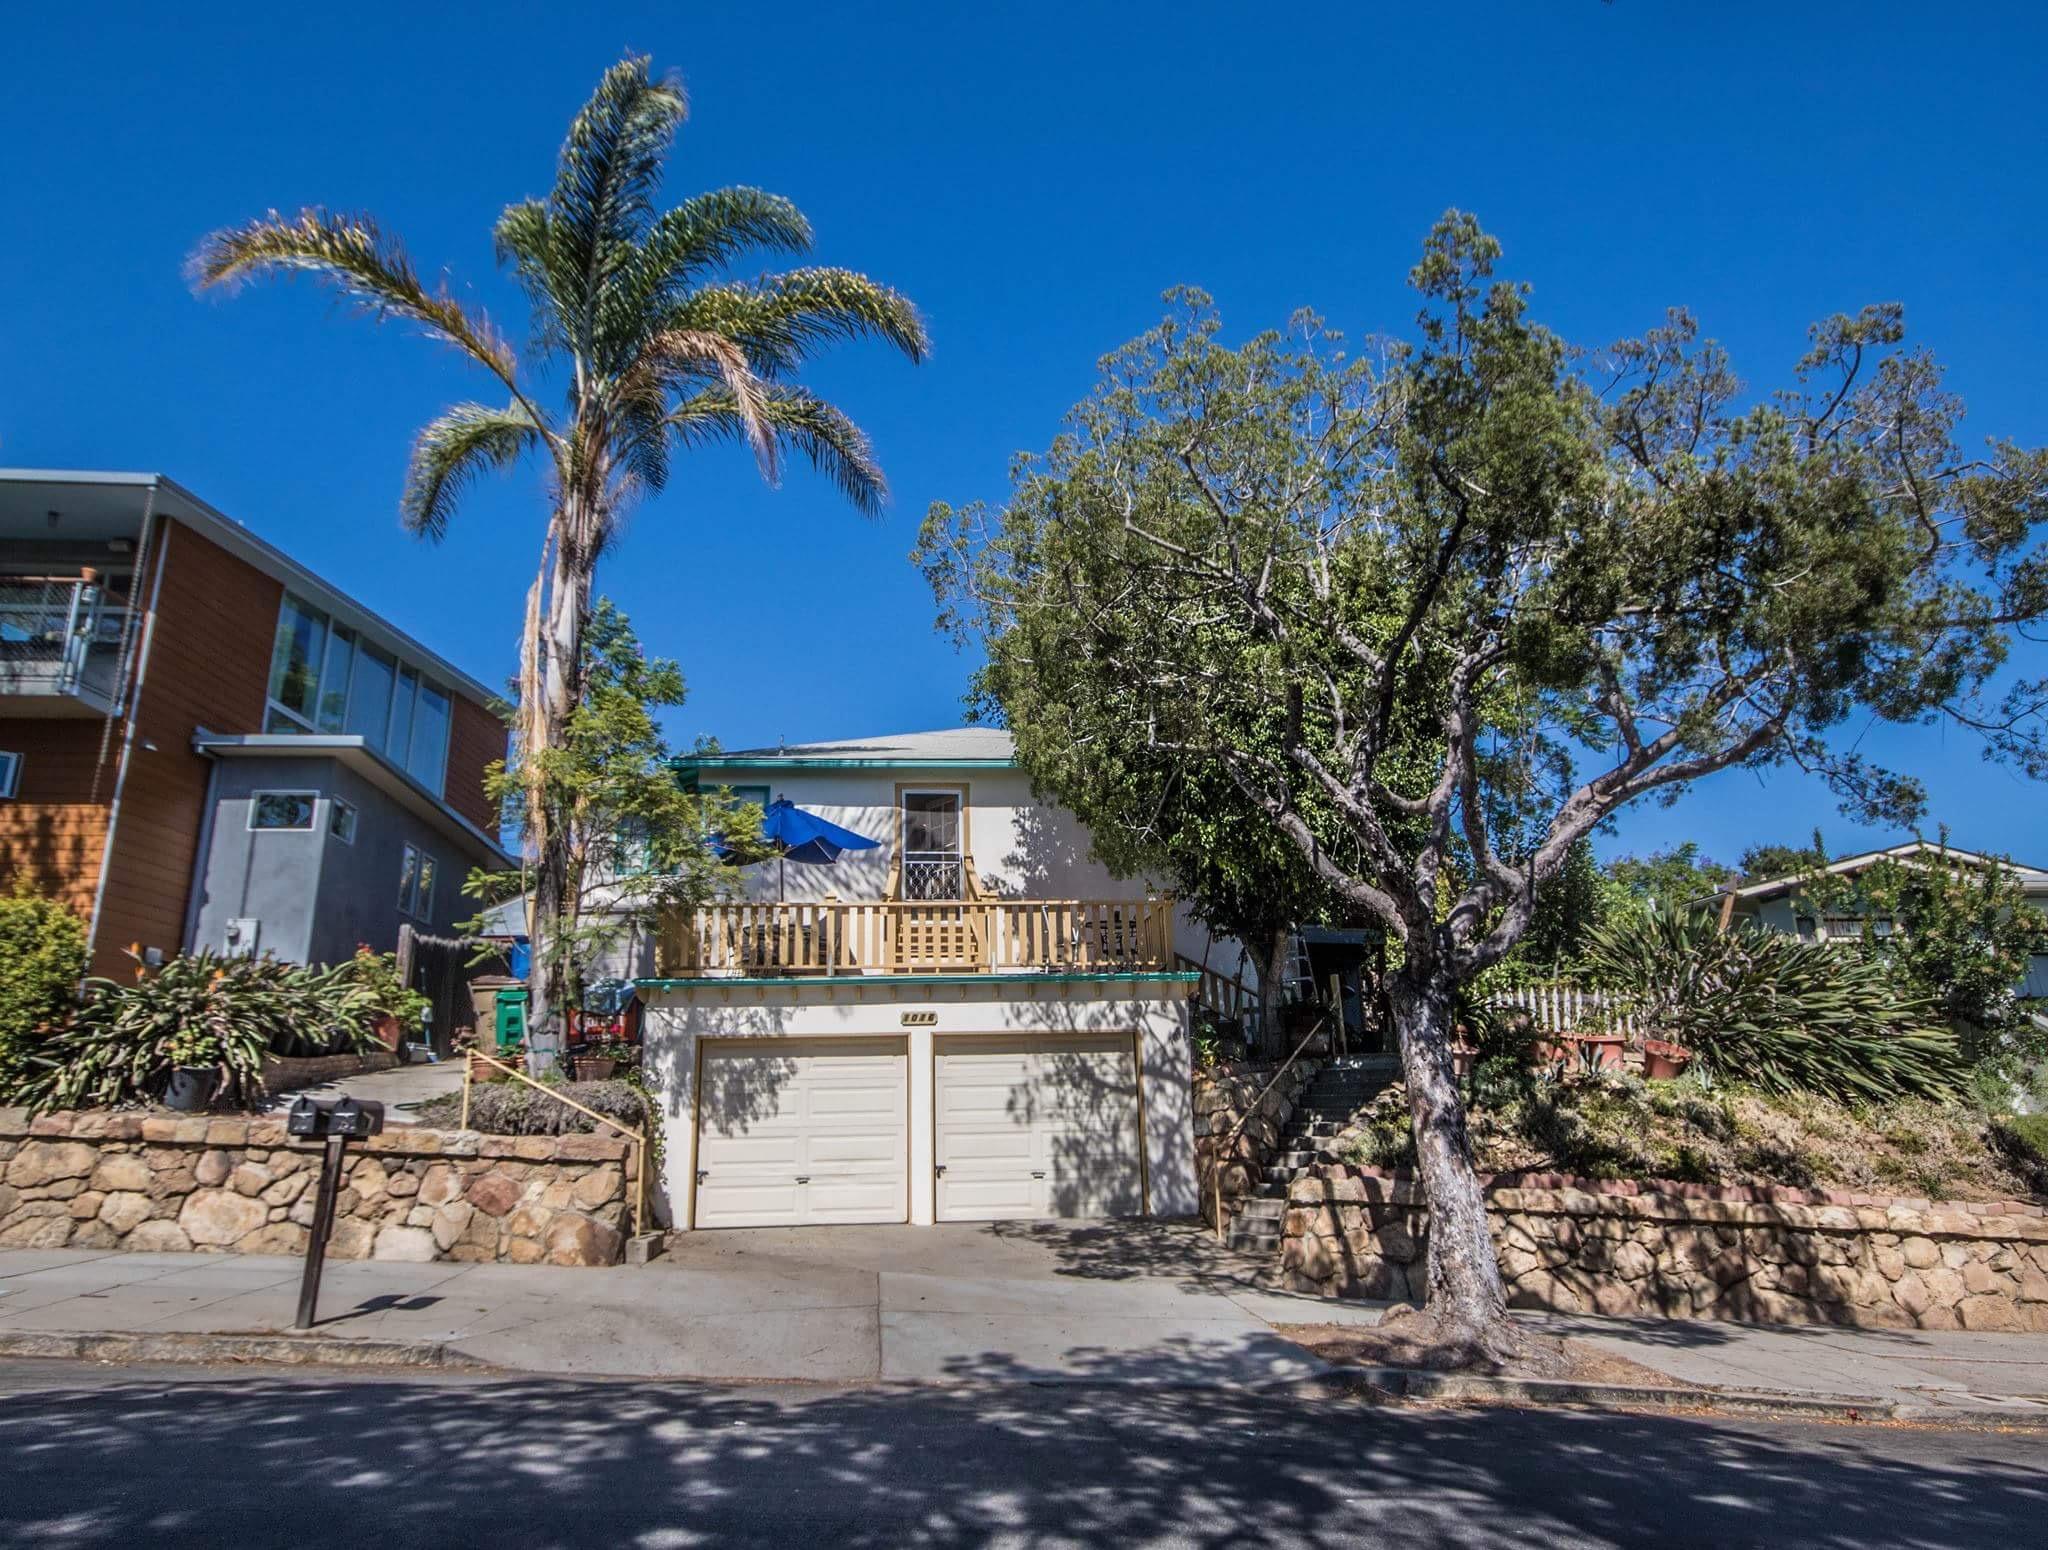 Property photo for 1016 N Milpas St Santa Barbara, California 93103 - 16-2828